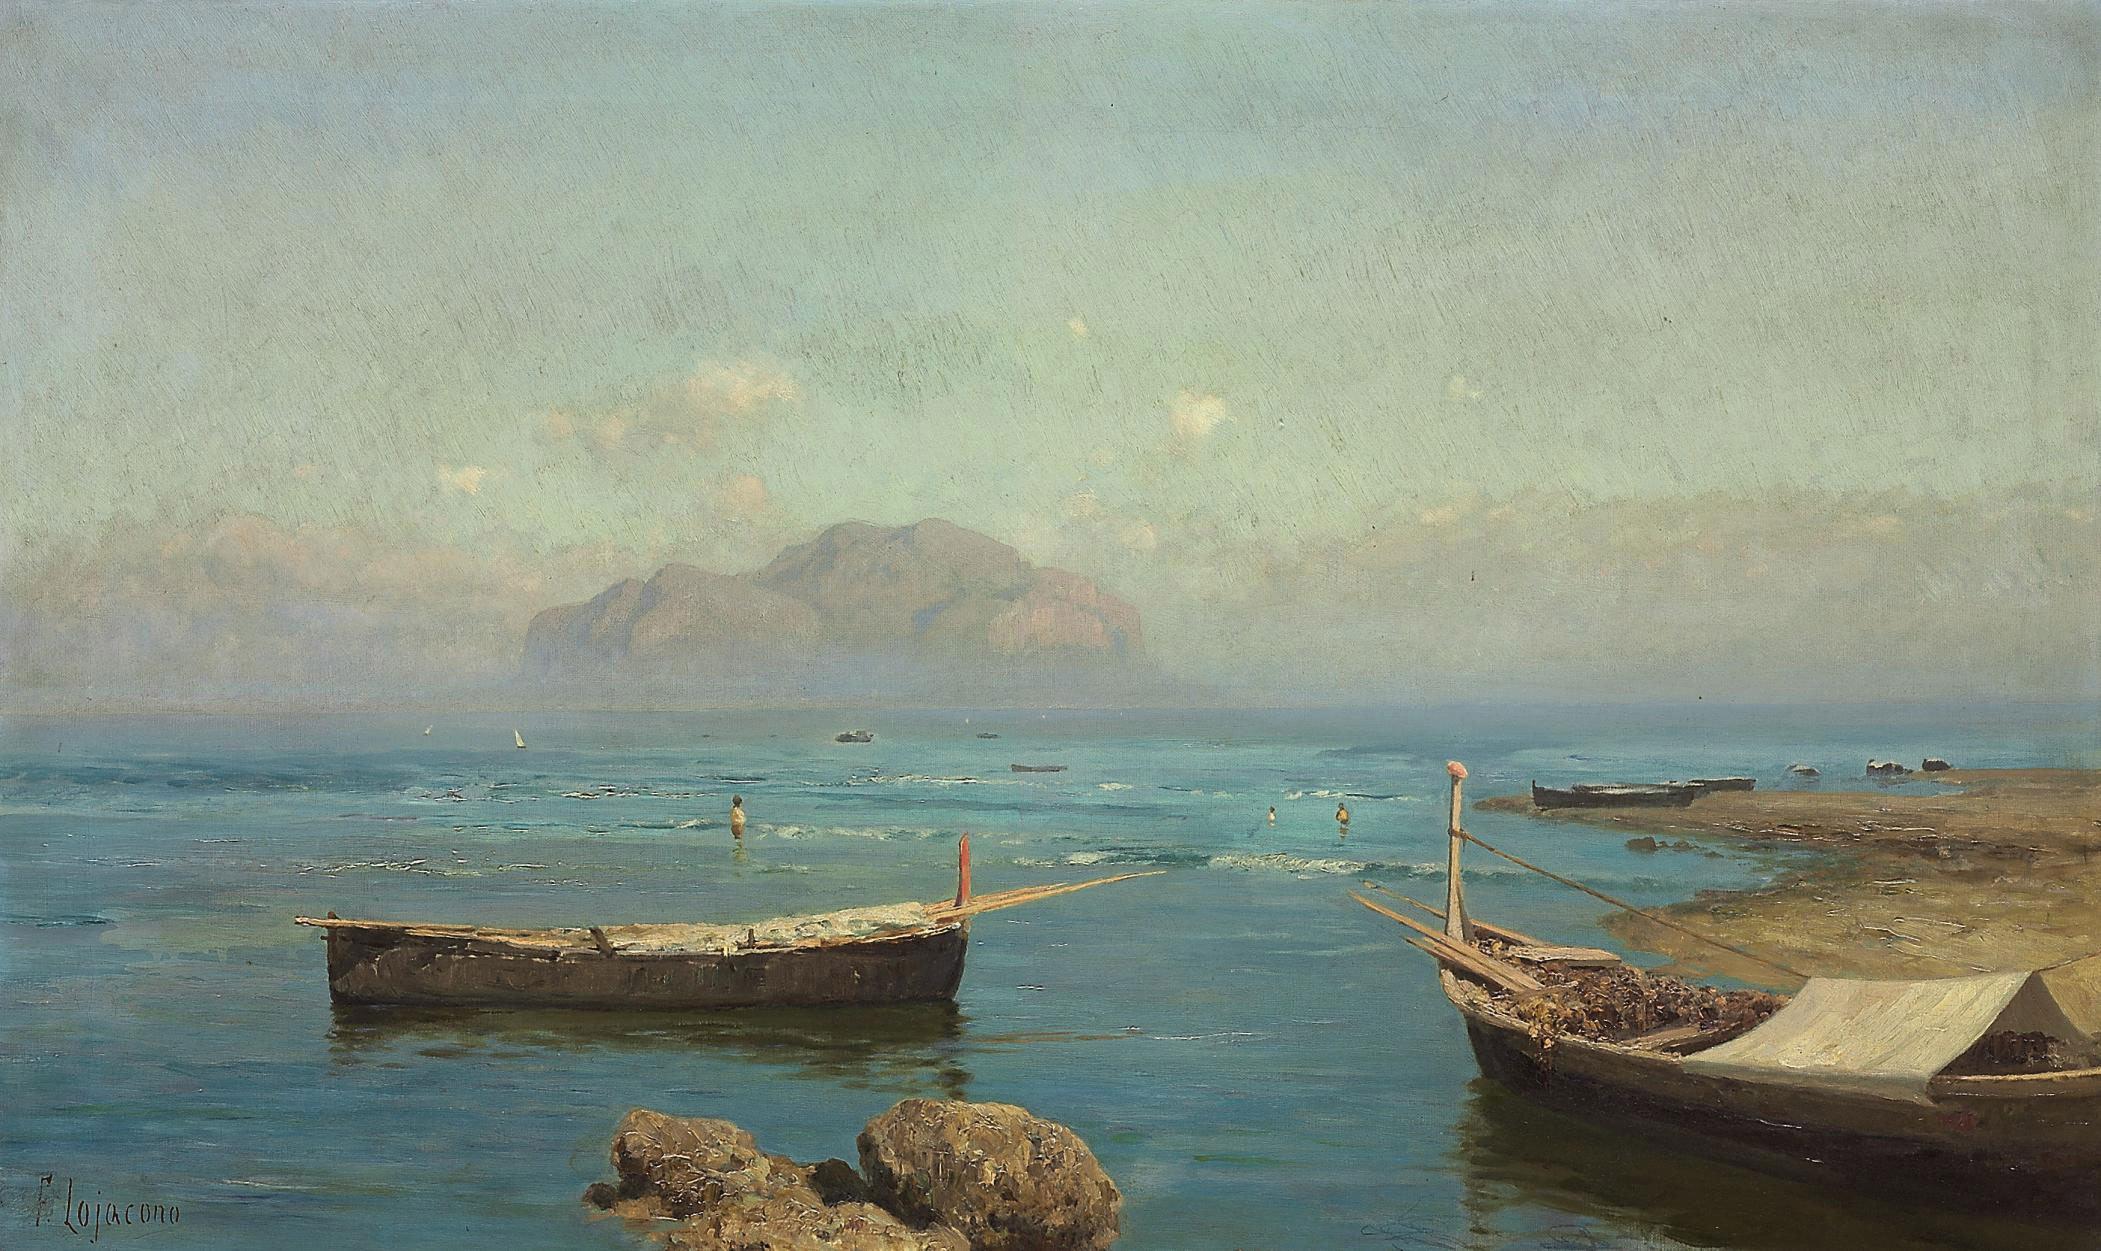 Monte Pellegrino, Palermo, Sicily